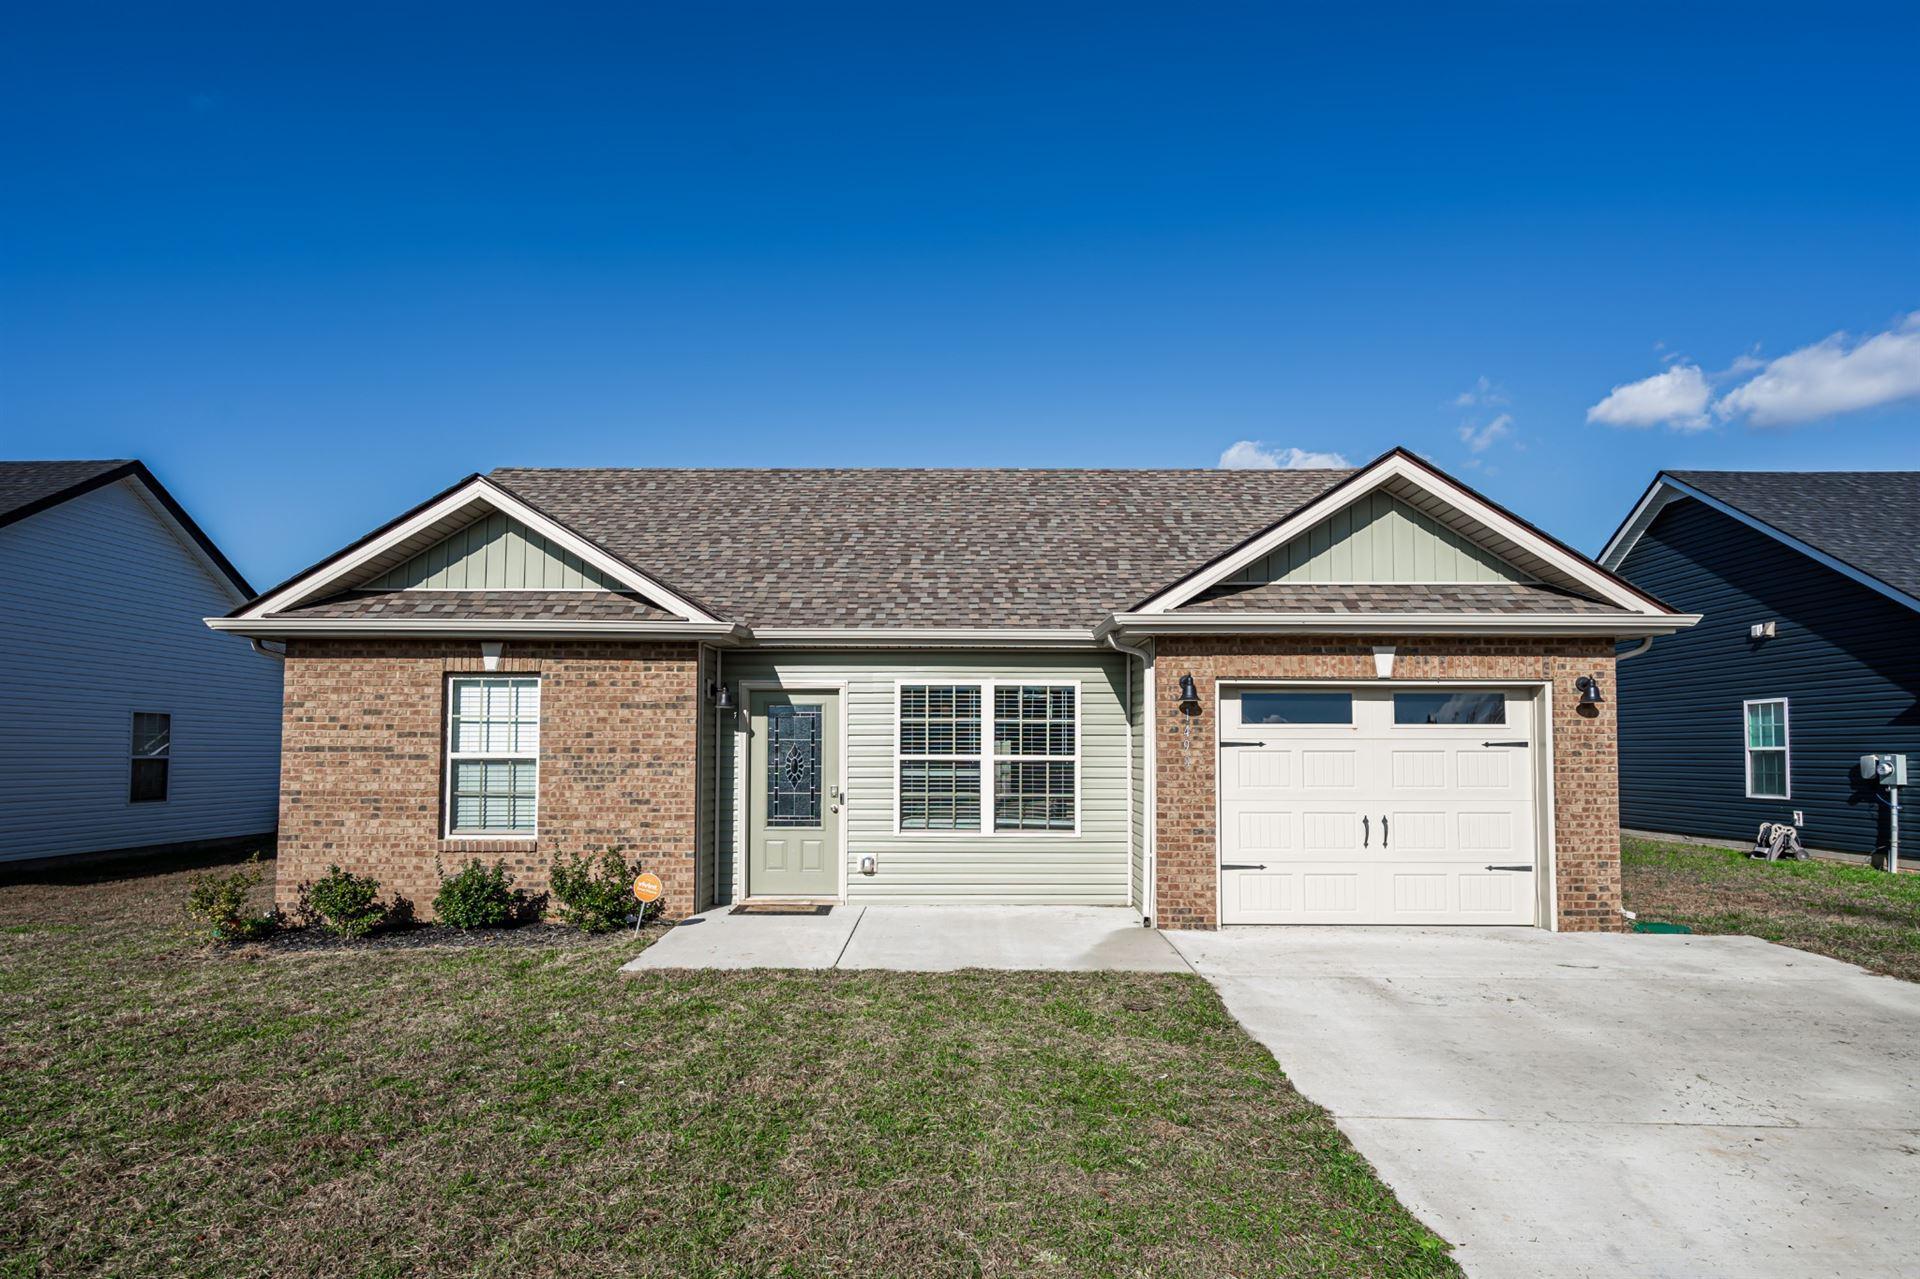 1493 Coronado Dr, Clarksville, TN 37042 - MLS#: 2209712